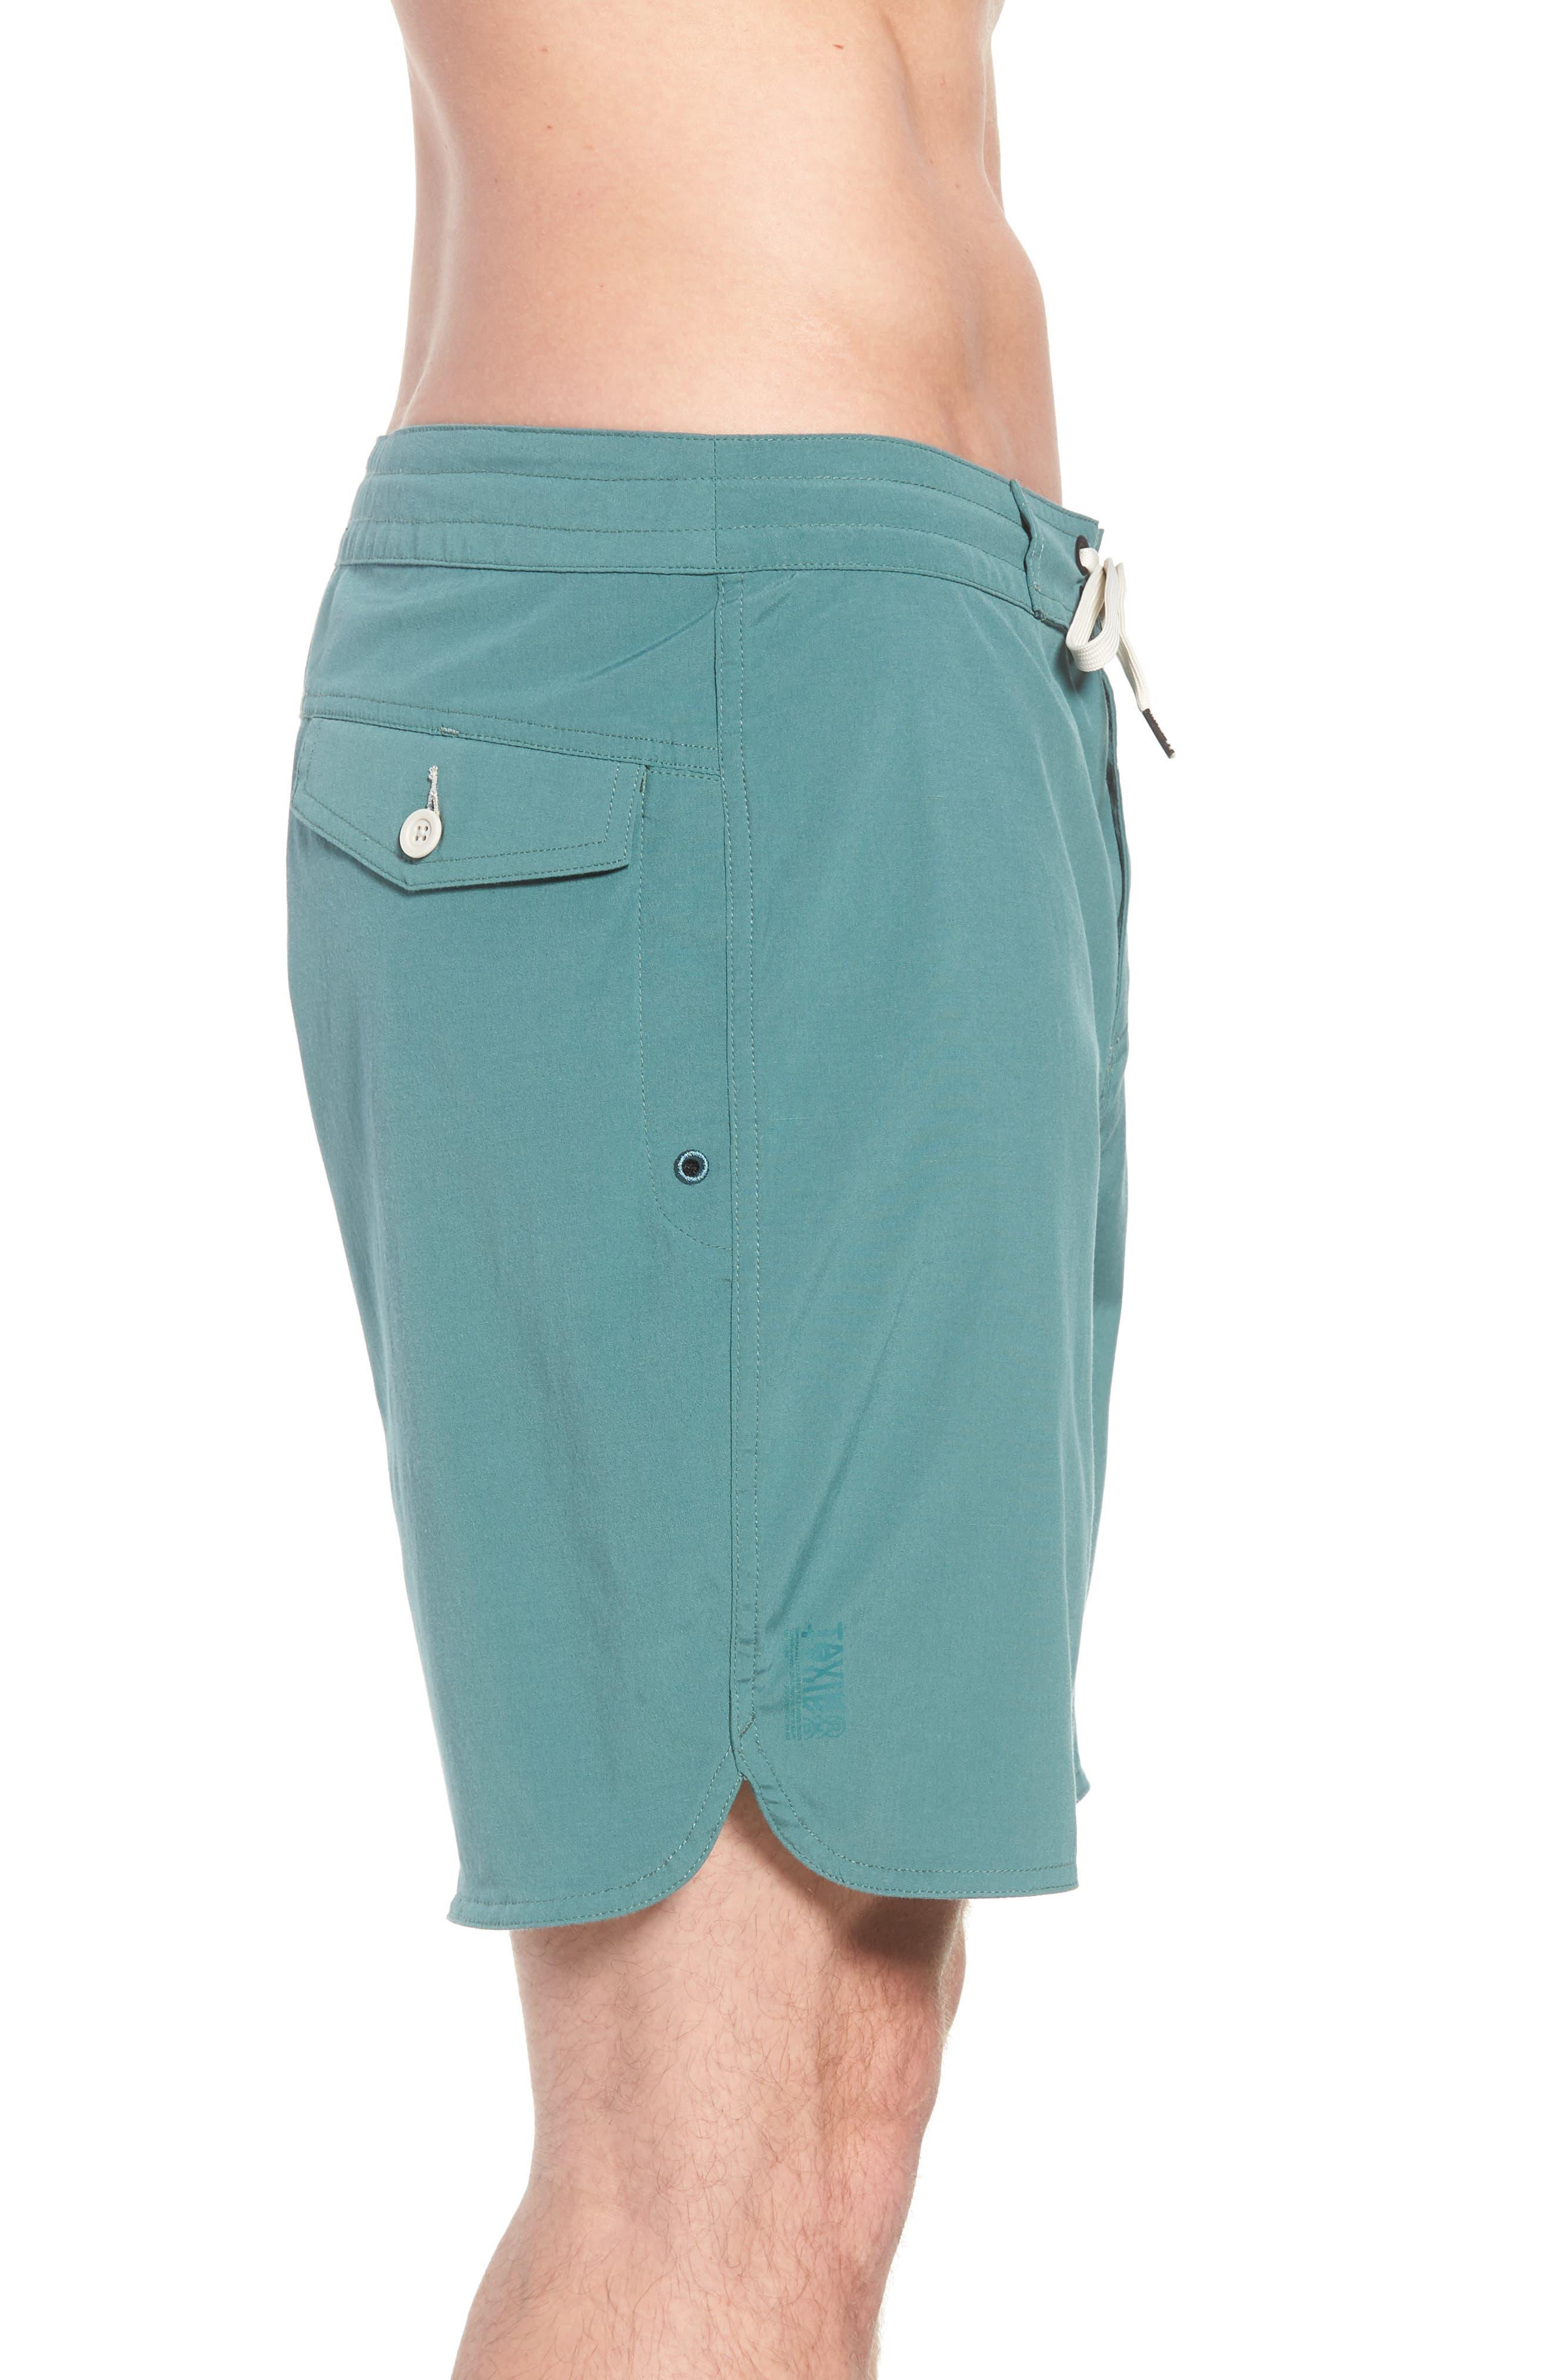 Avalon Board Shorts,                             Alternate thumbnail 4, color,                             Palm Green